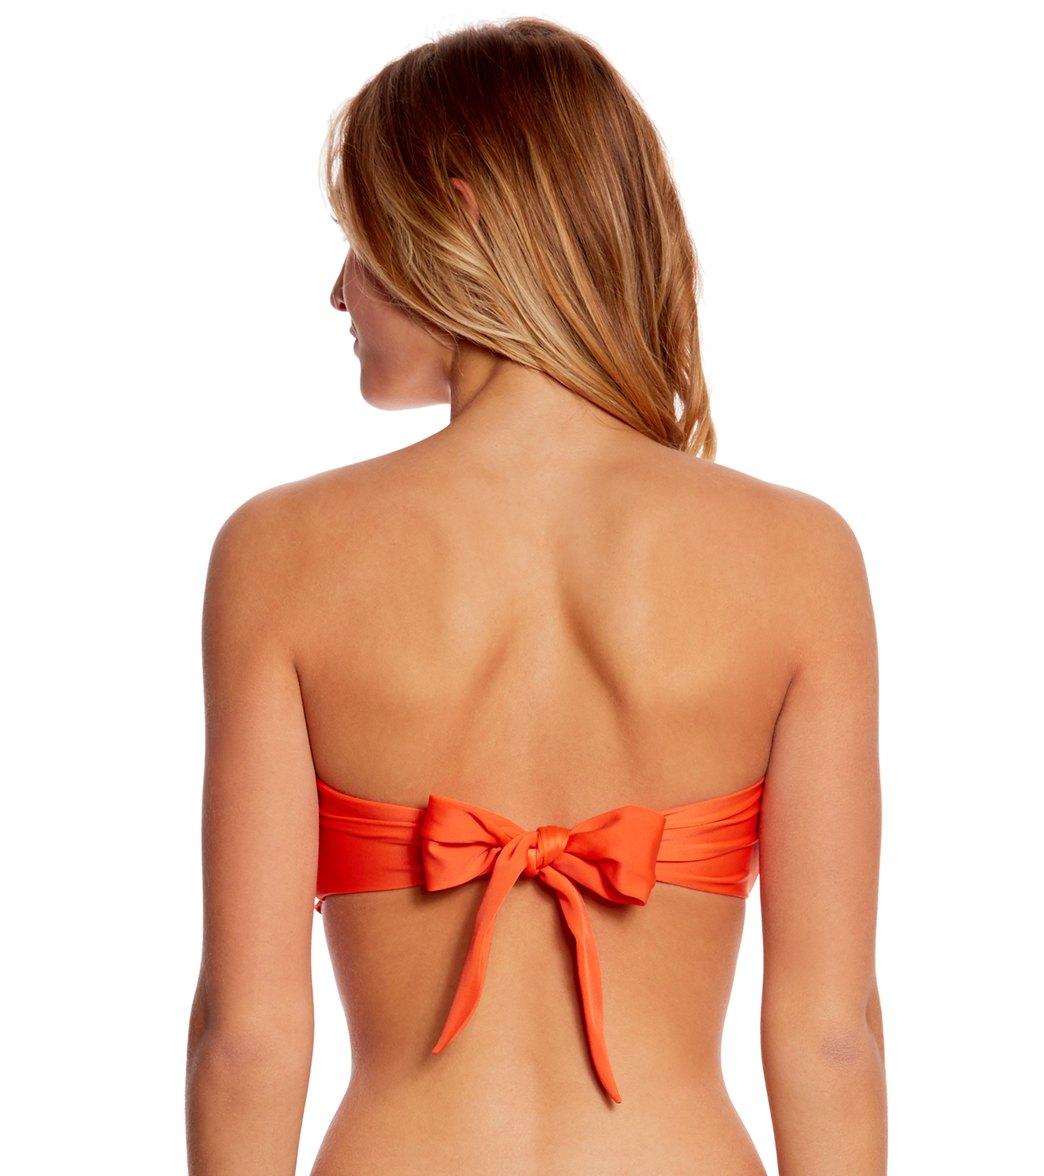 cff5649f3f Sofia Solid Orange Ripple Bandeau Top at SwimOutlet.com - Free Shipping